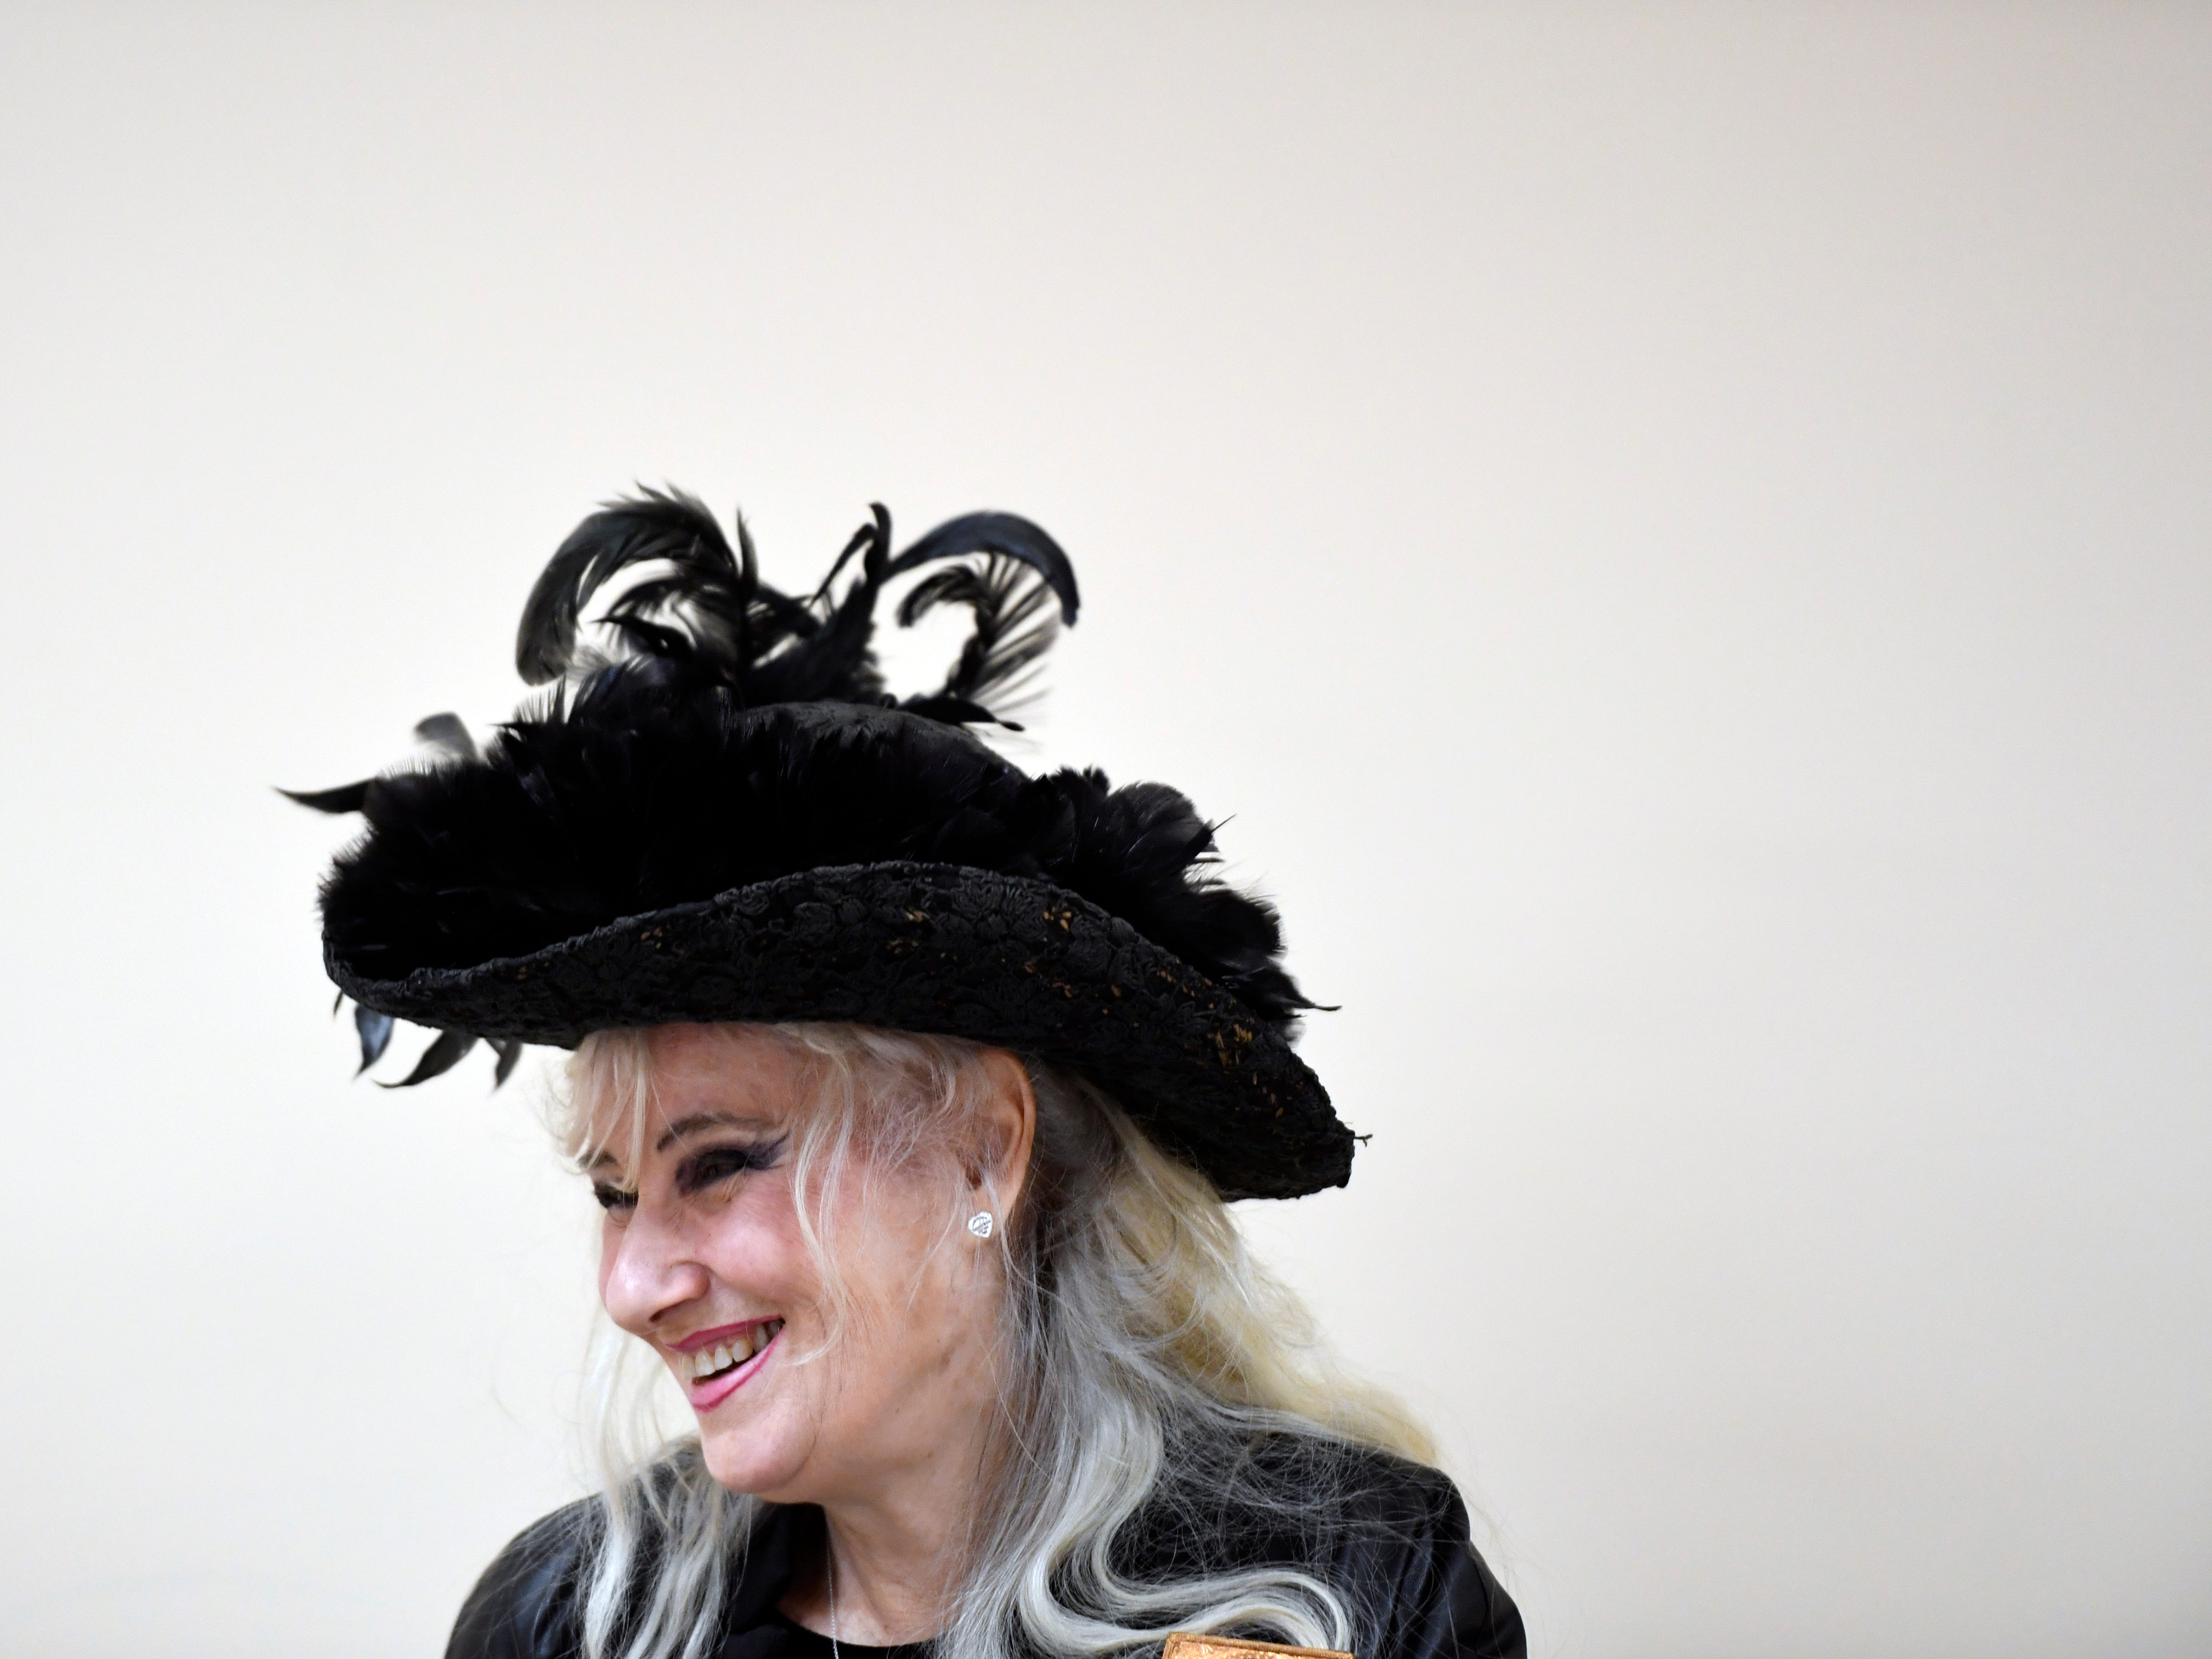 With a black dress, dark stories and jokes, she helps regular people write memoirs